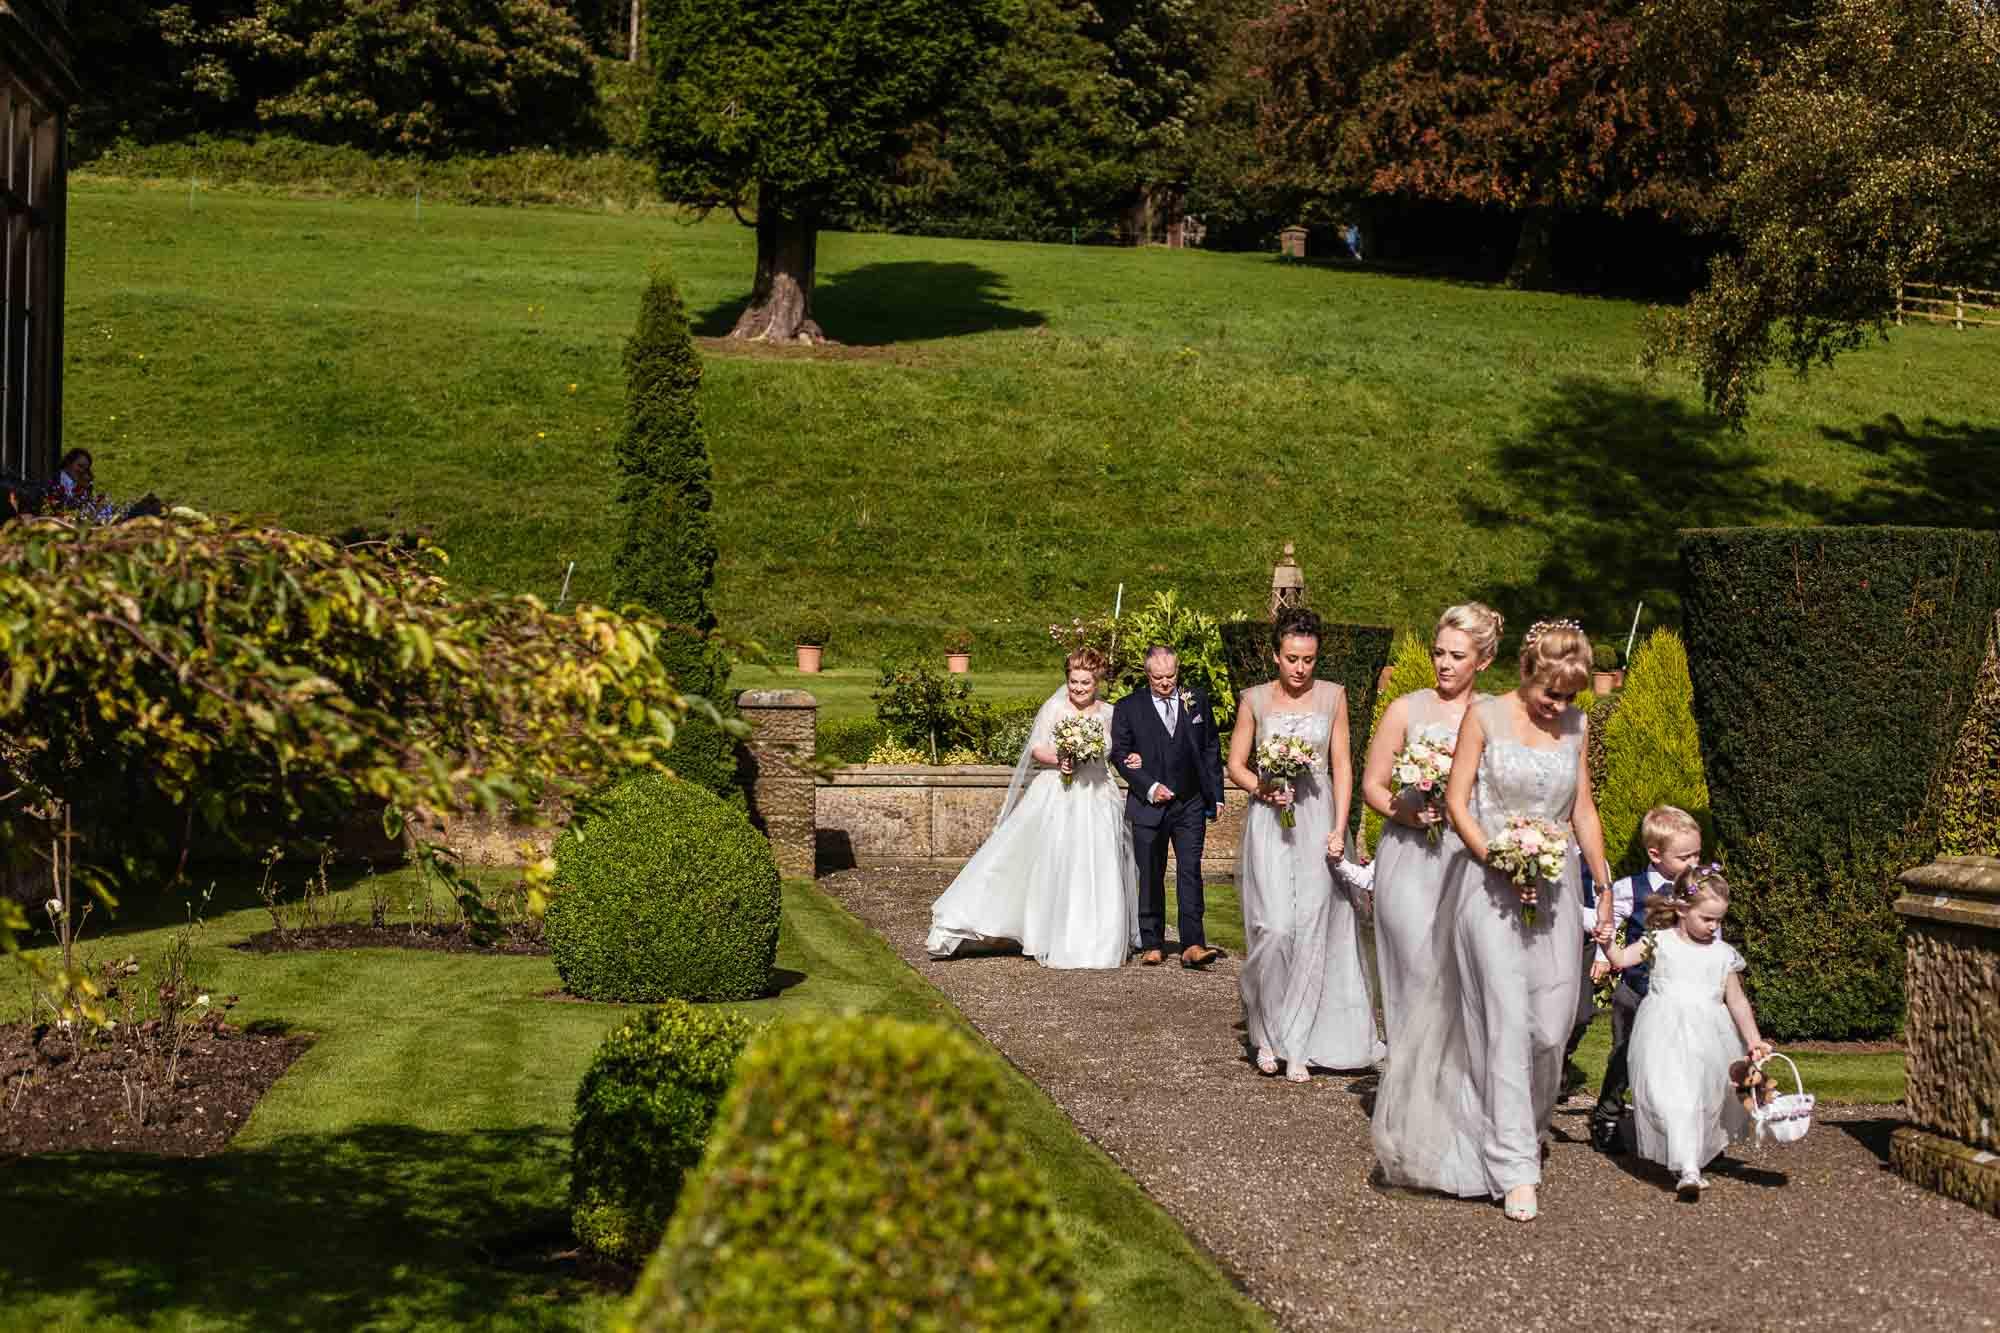 Cressbrook Hall Weddings